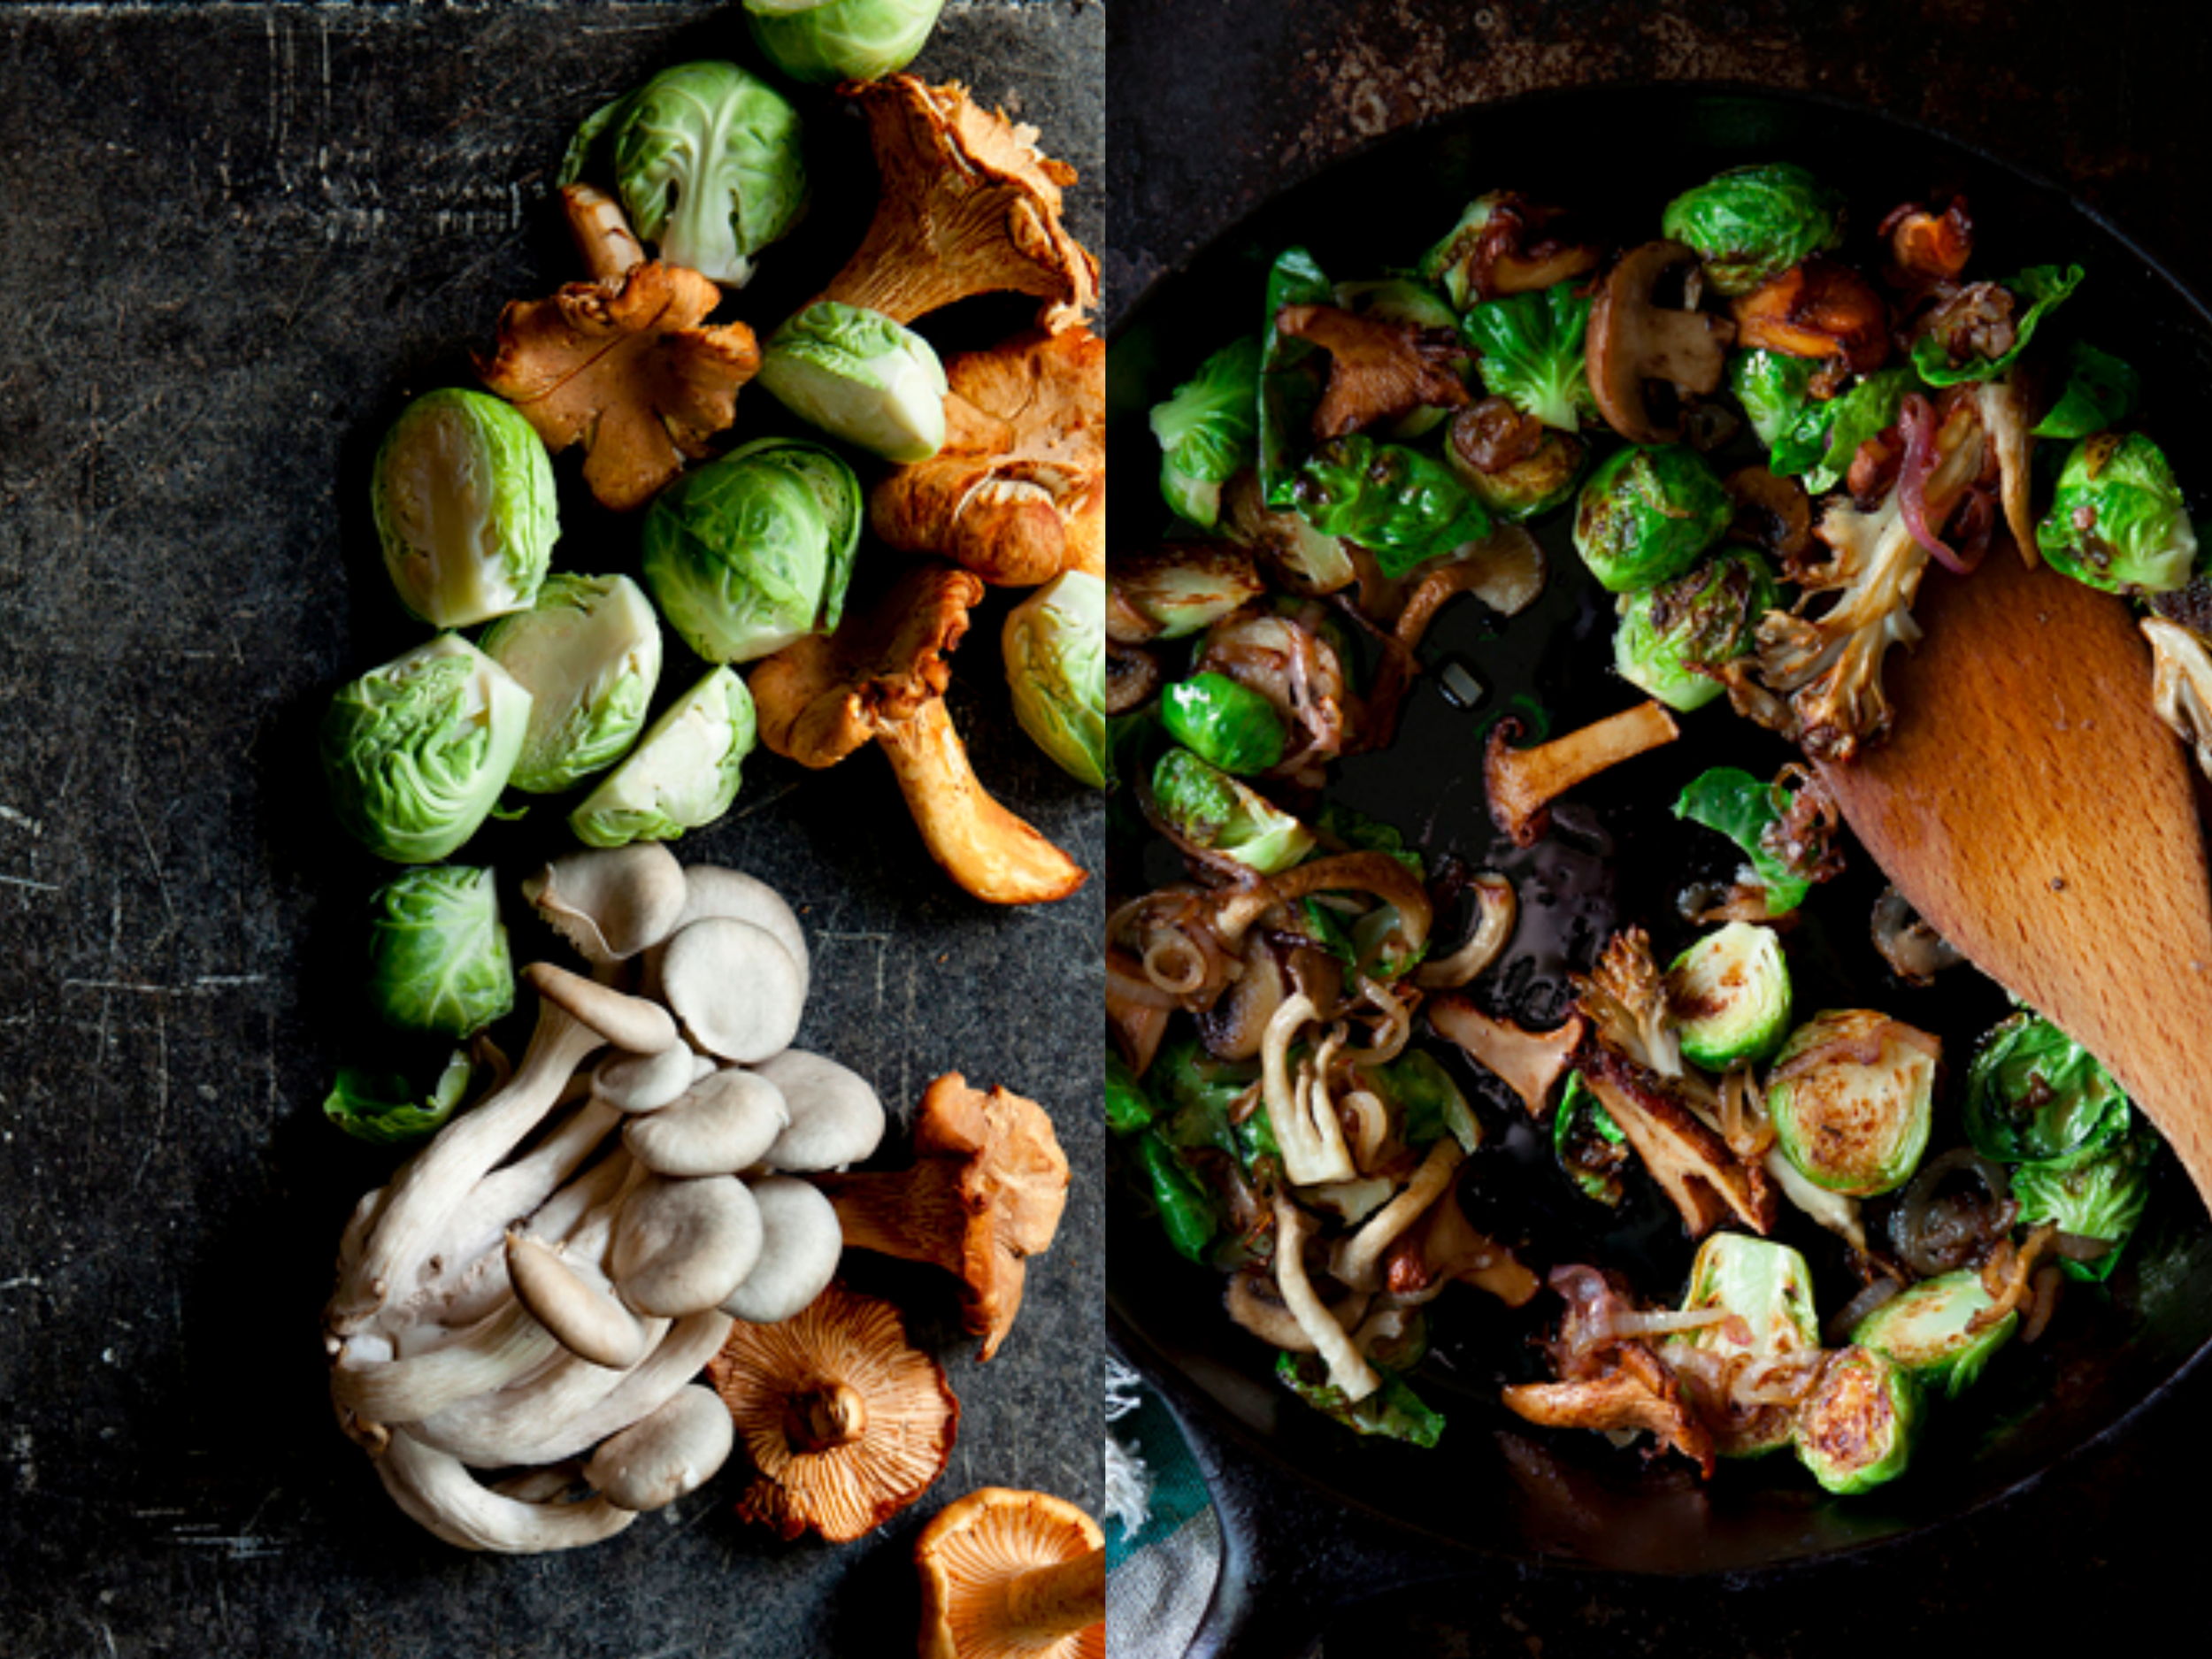 020 Mushroom Brusselsprout Collage.jpg